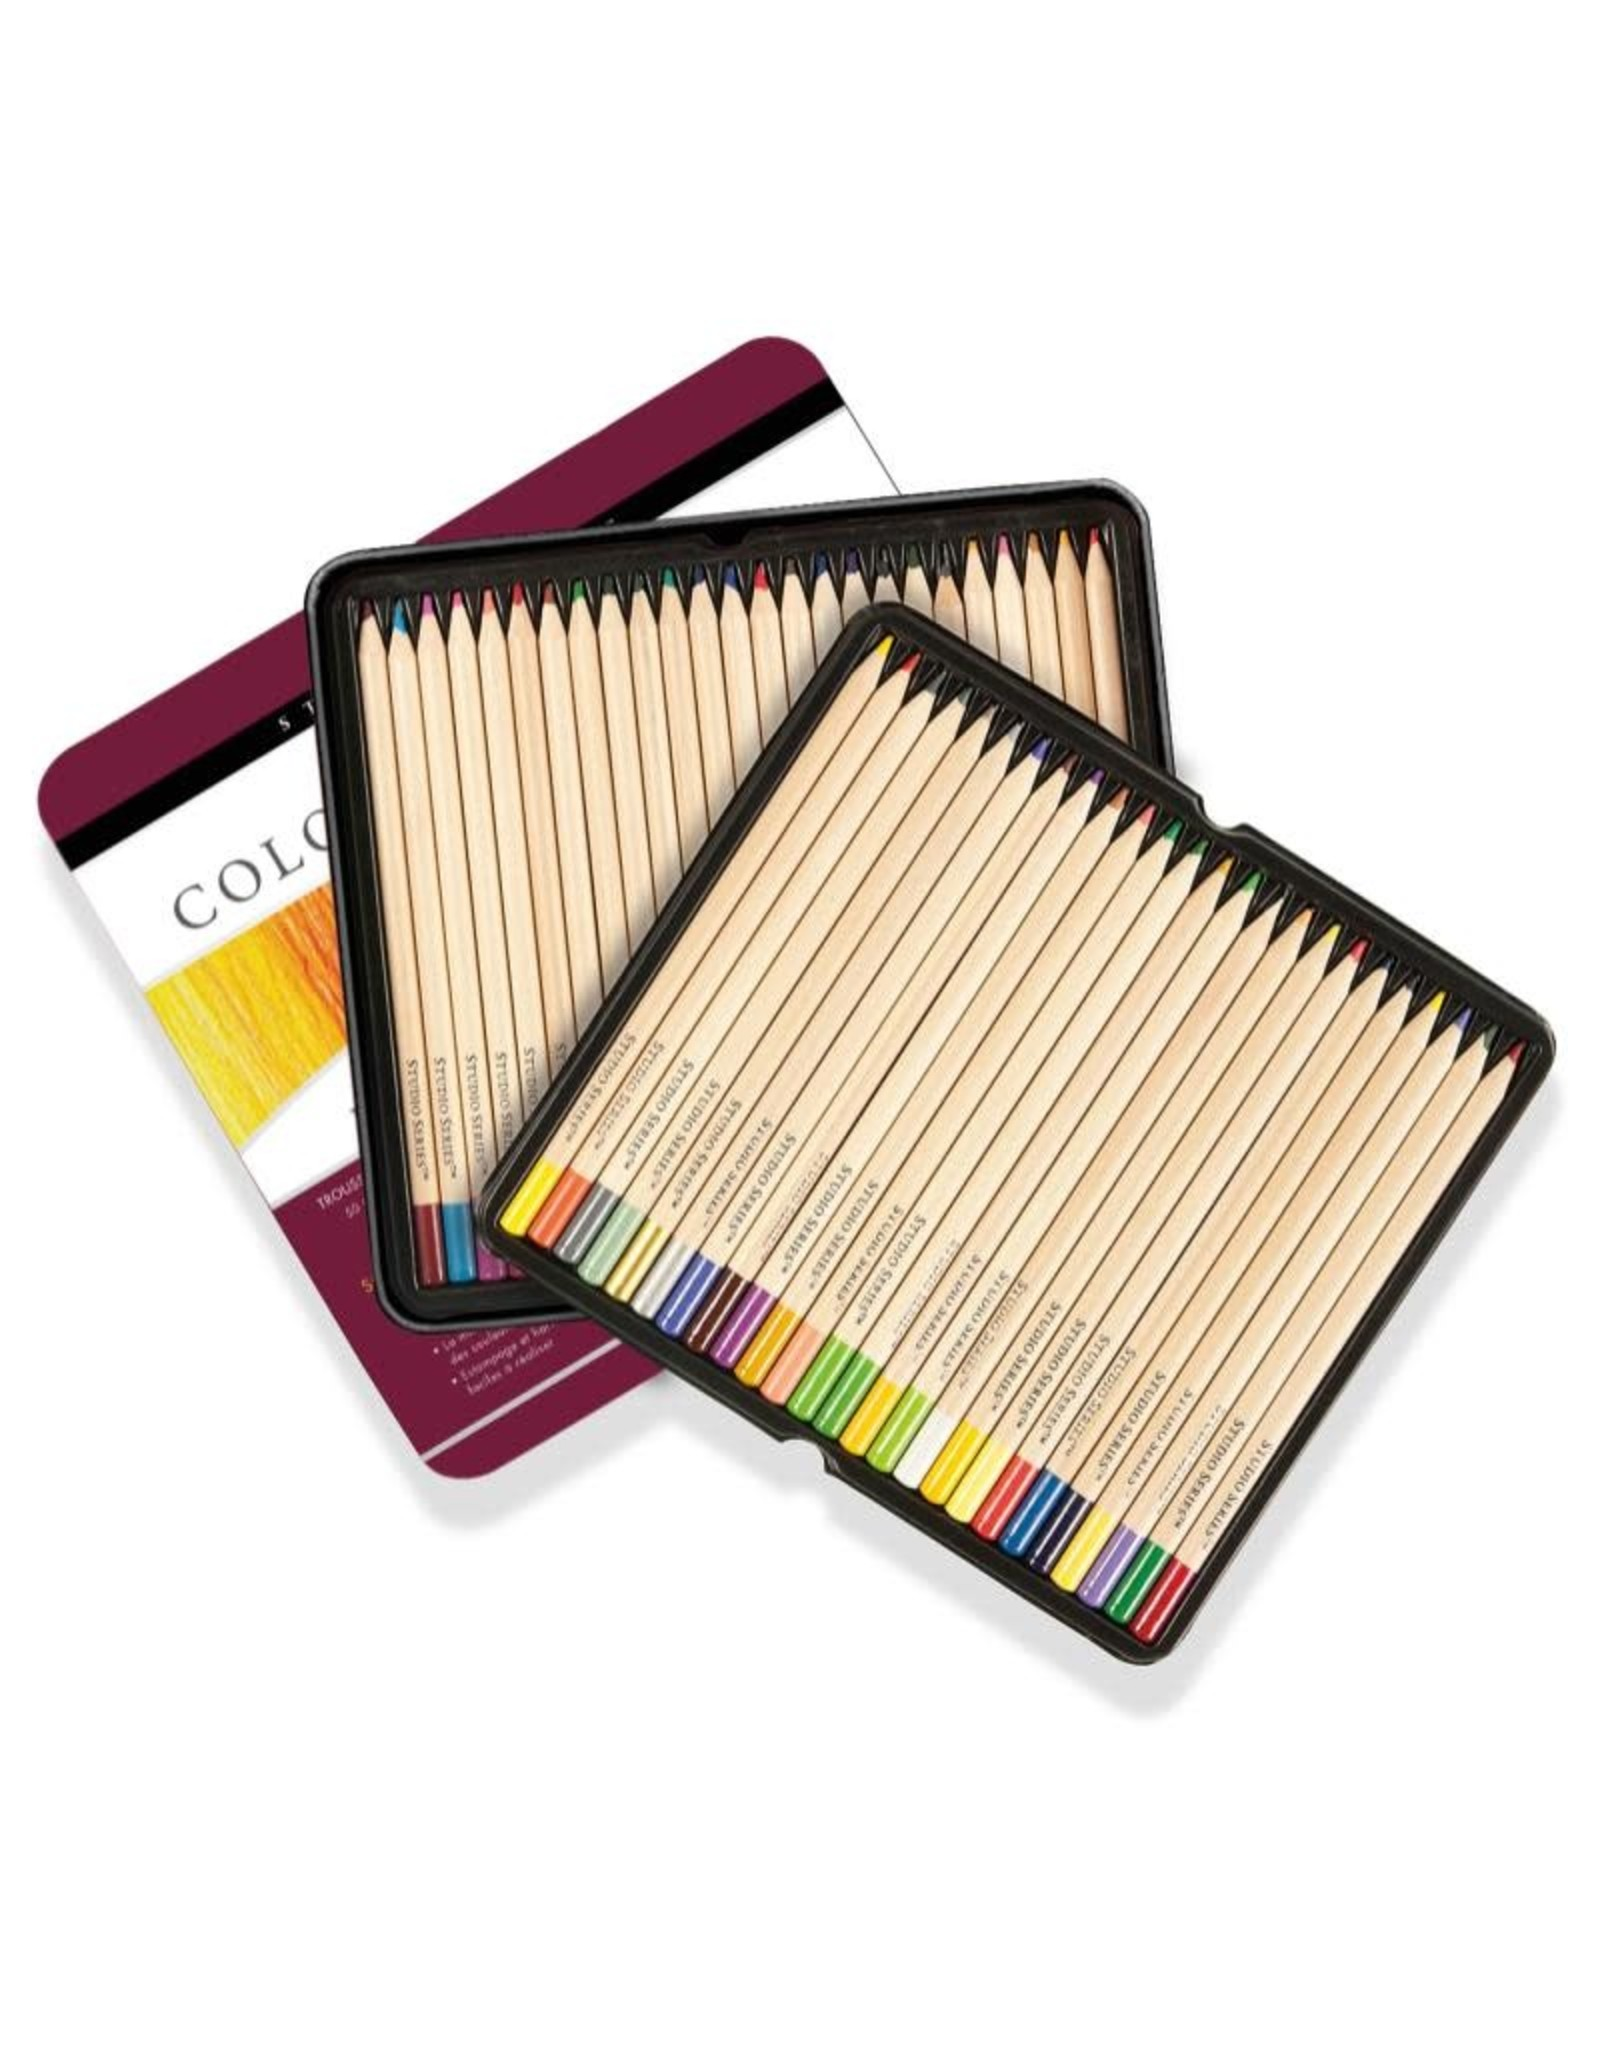 Peter Pauper Deluxe Colored Pencils